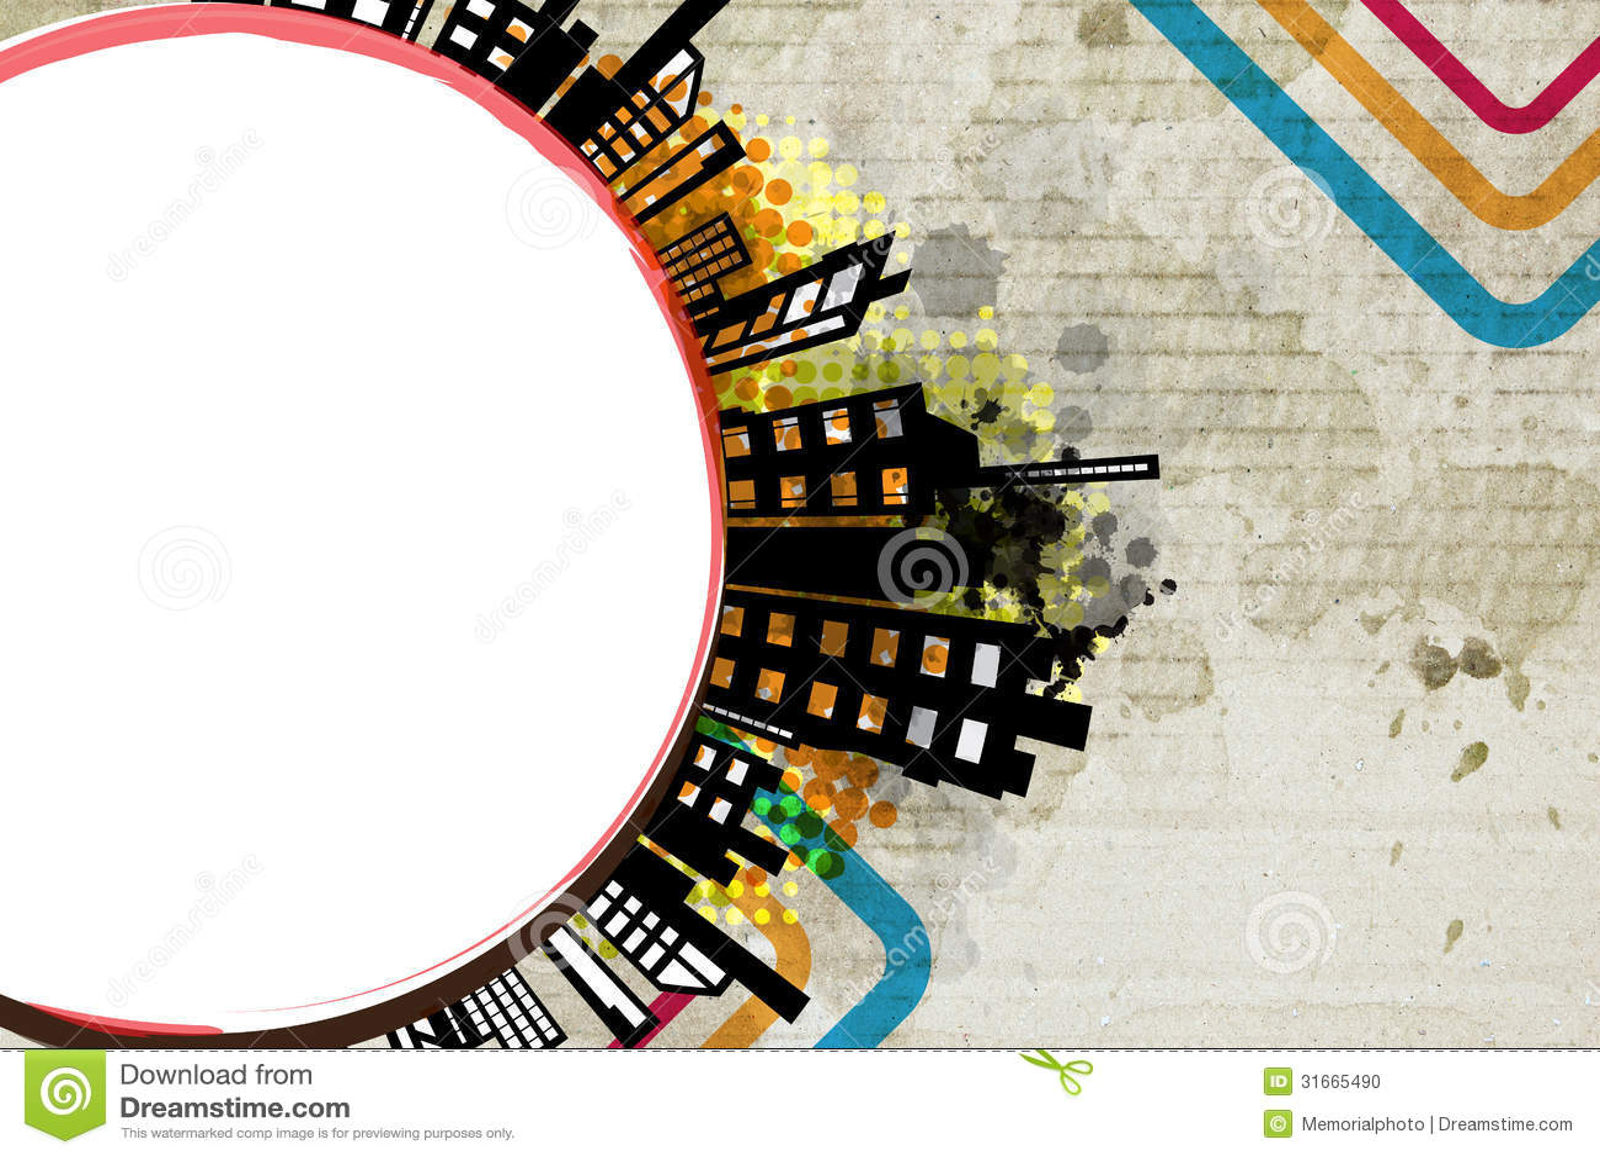 abstract design circle sector - photo #33